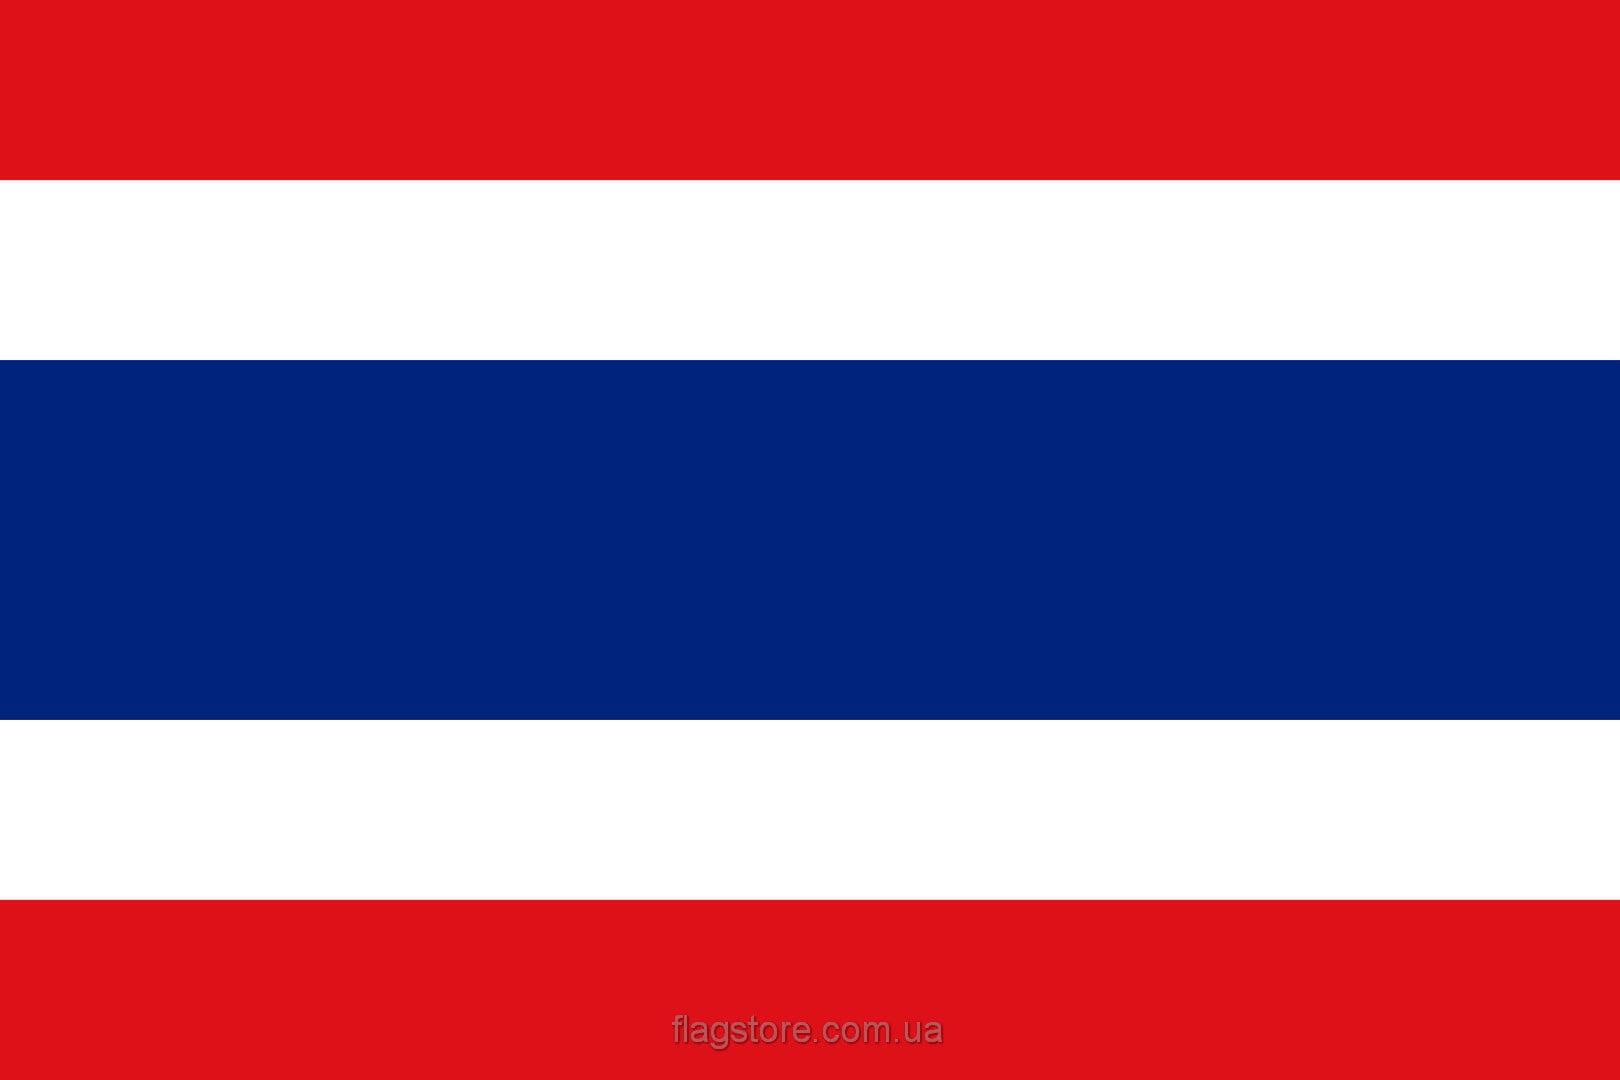 Купить флаг Таиланда (страны Таиланд)